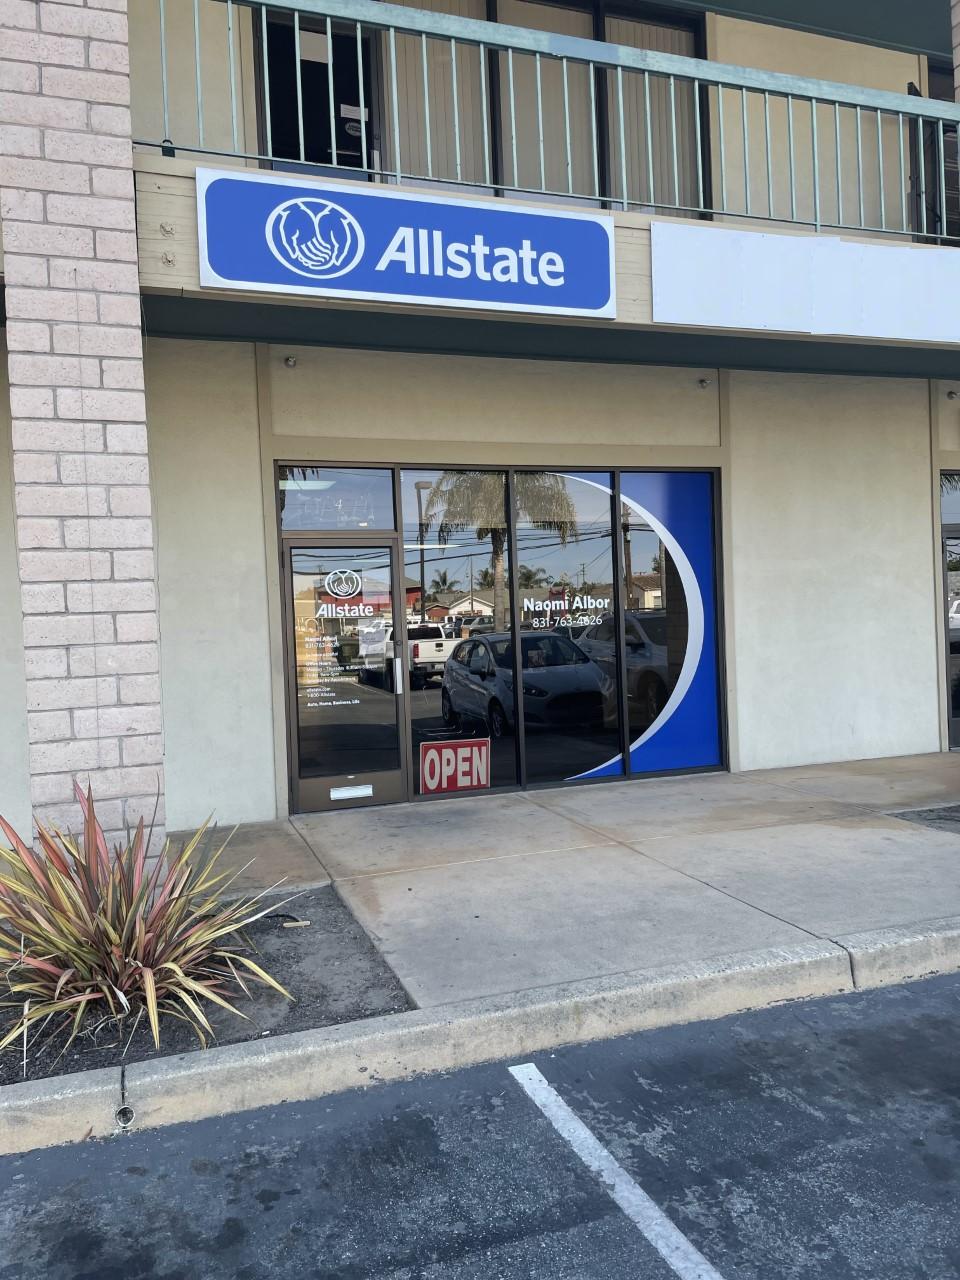 Huizar-Albor Insurance Agency Inc.: Allstate Insurance